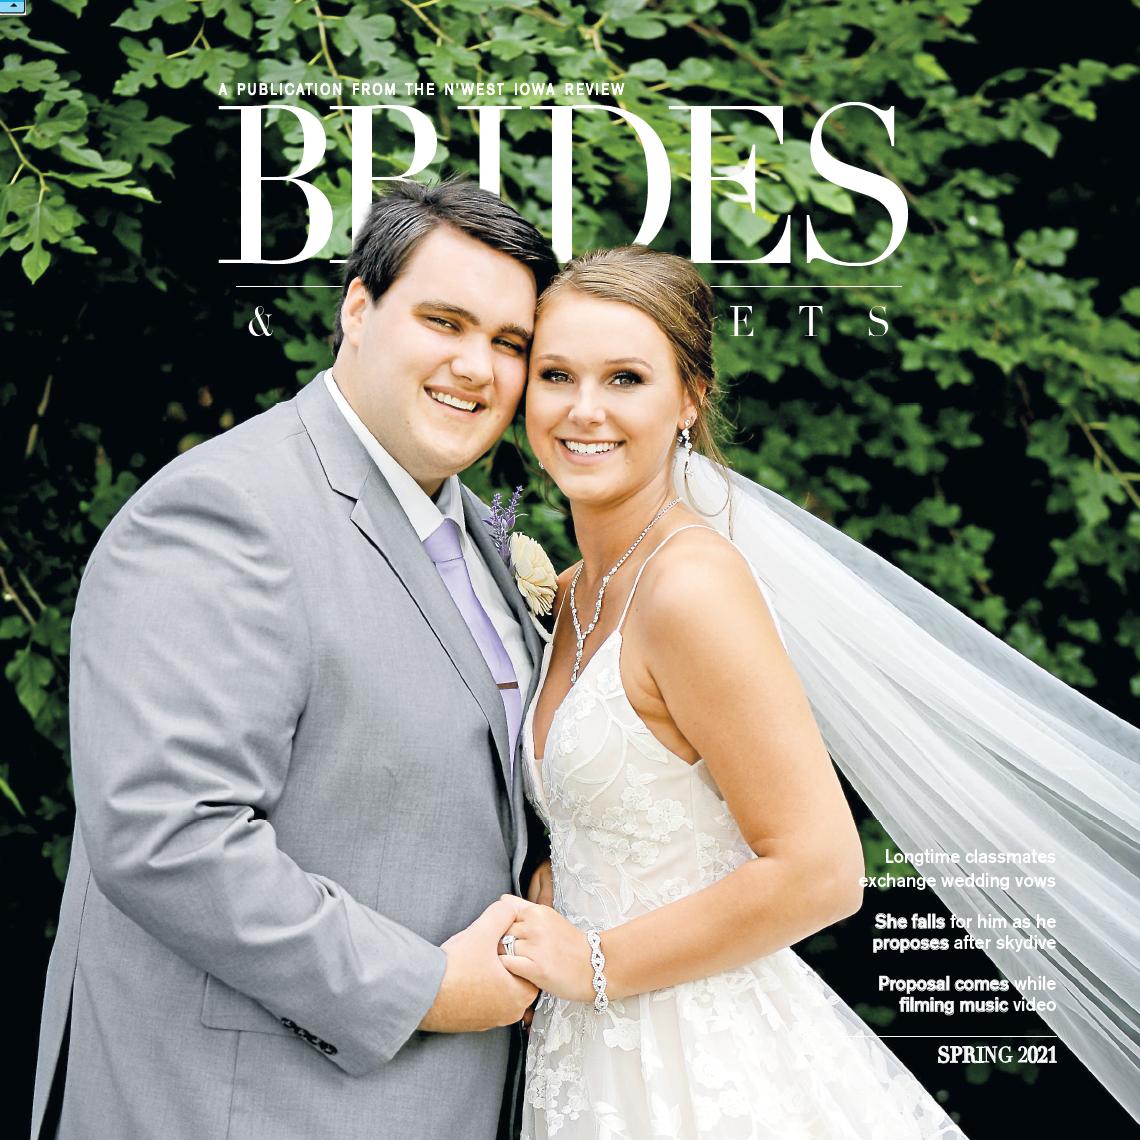 Brides & Bouquets Spring 2021